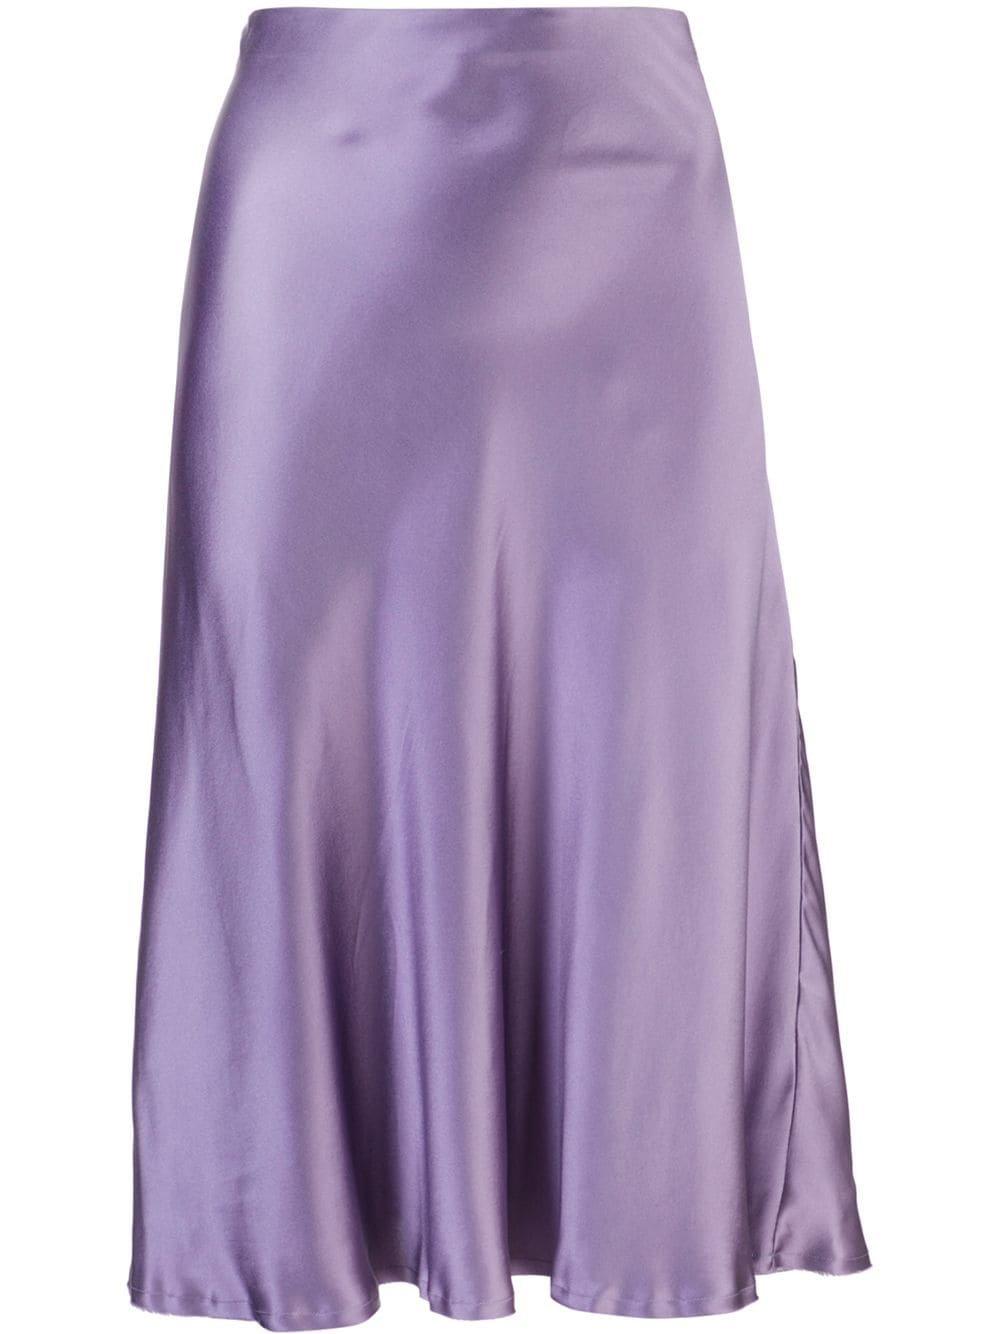 Nili Lotan Silk Midi Skirt